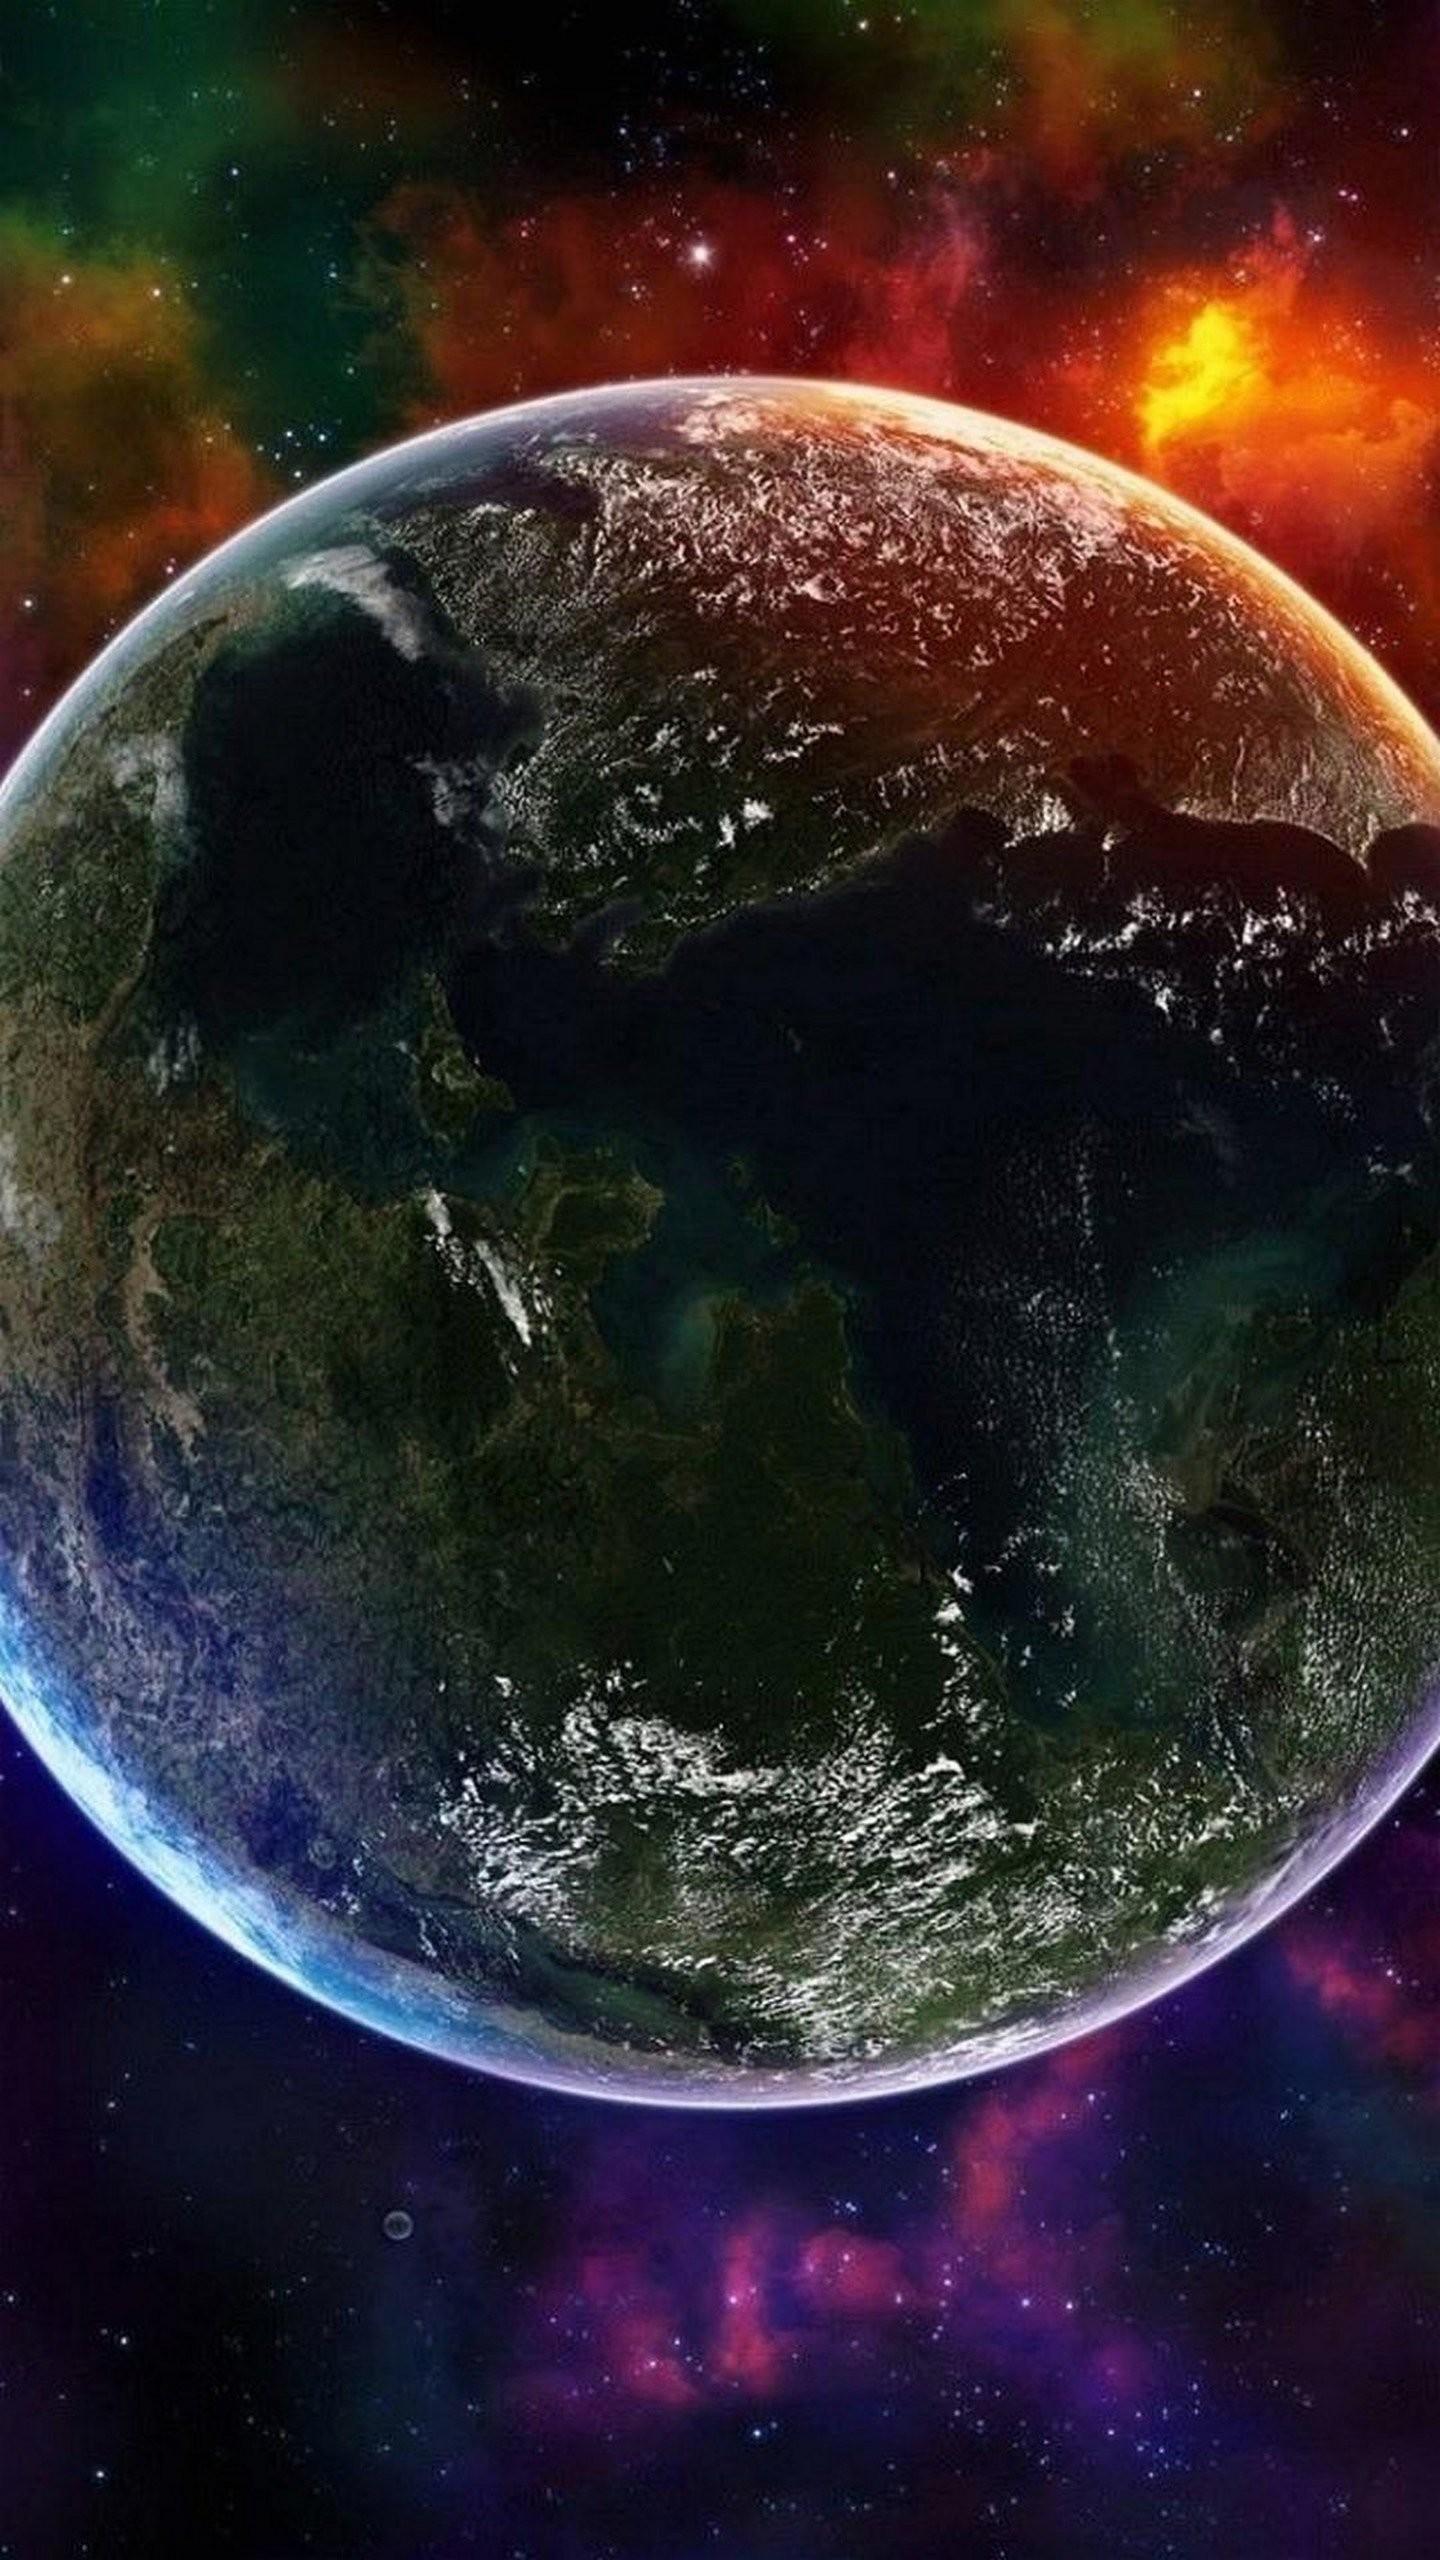 Wallpaper Sony Xperia Z4 Quad Hd Earth Planet 1.